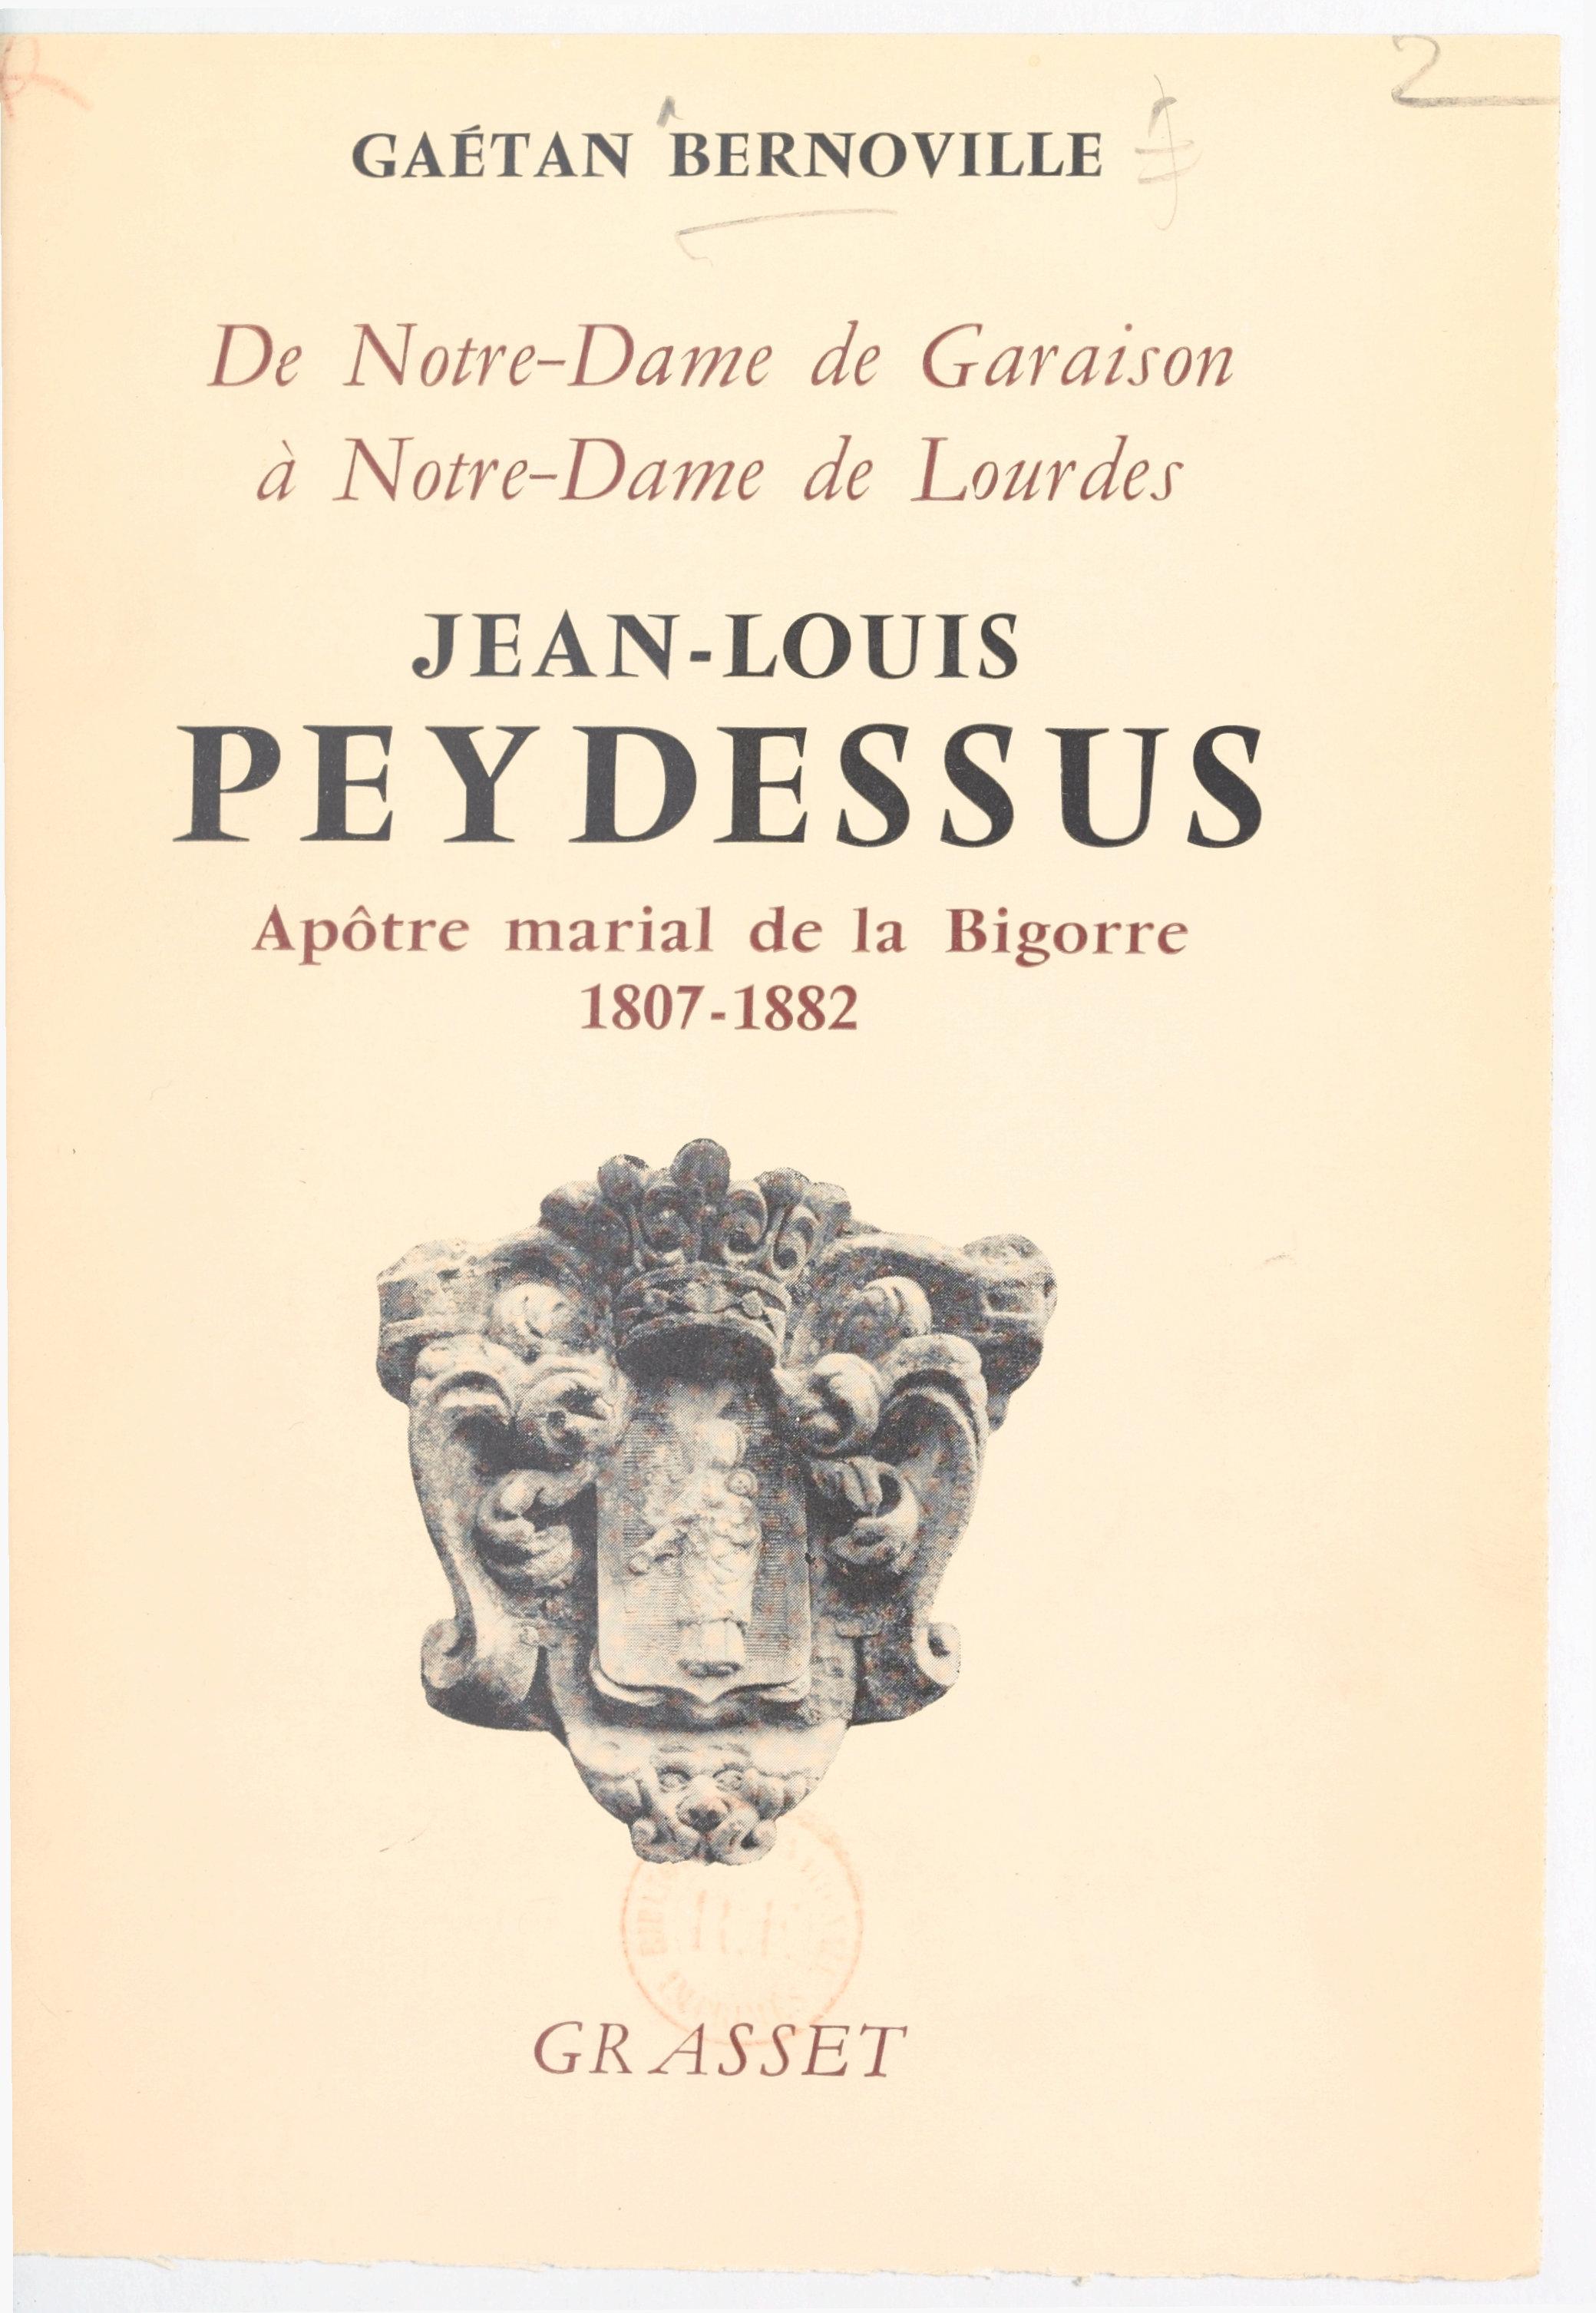 Jean-Louis Peydessus